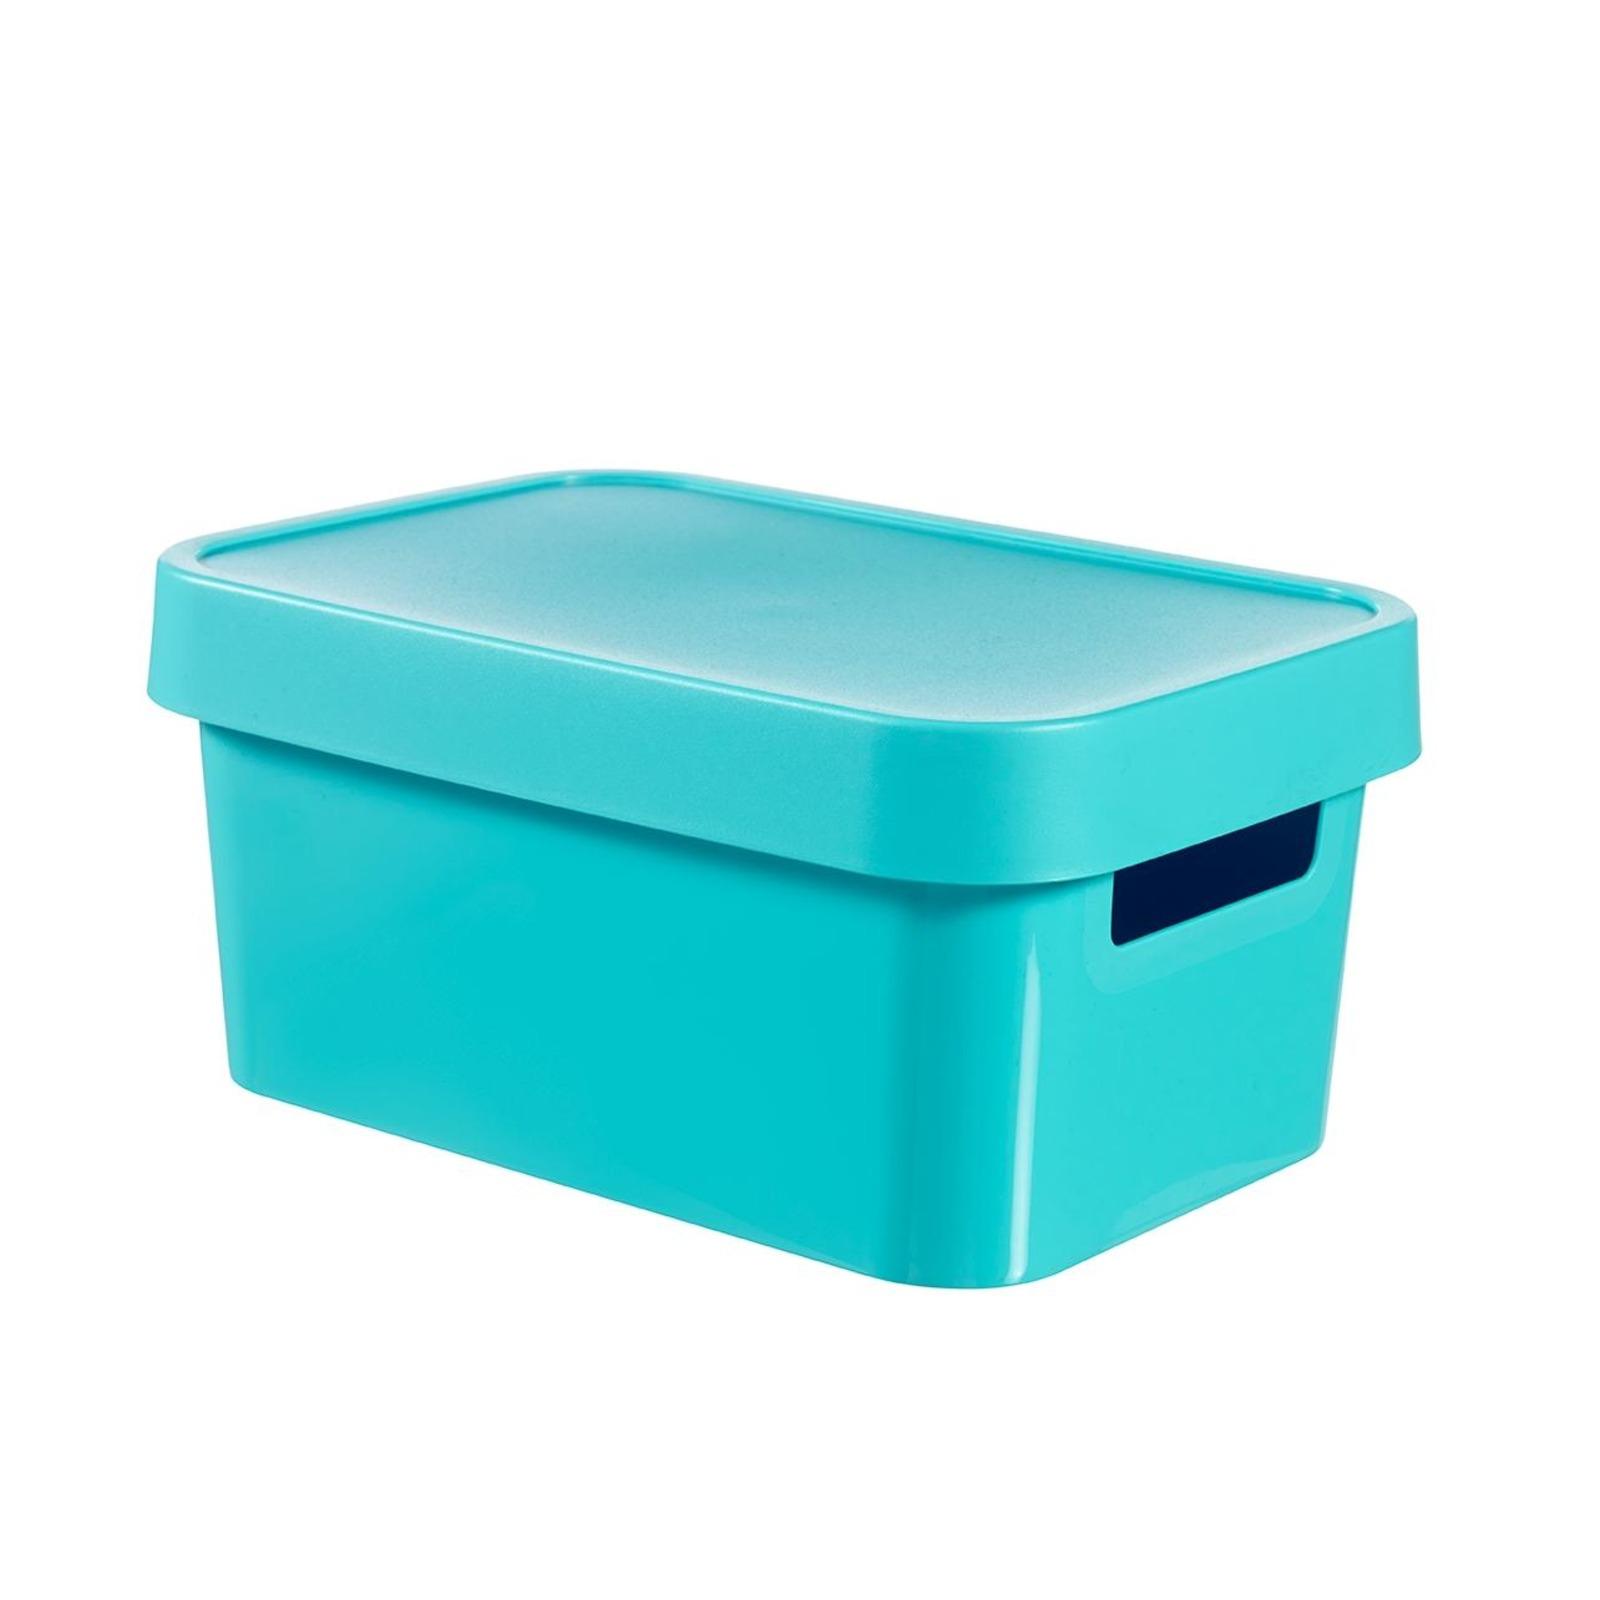 CURVER Infinity Box 4.5L + Lid Blue